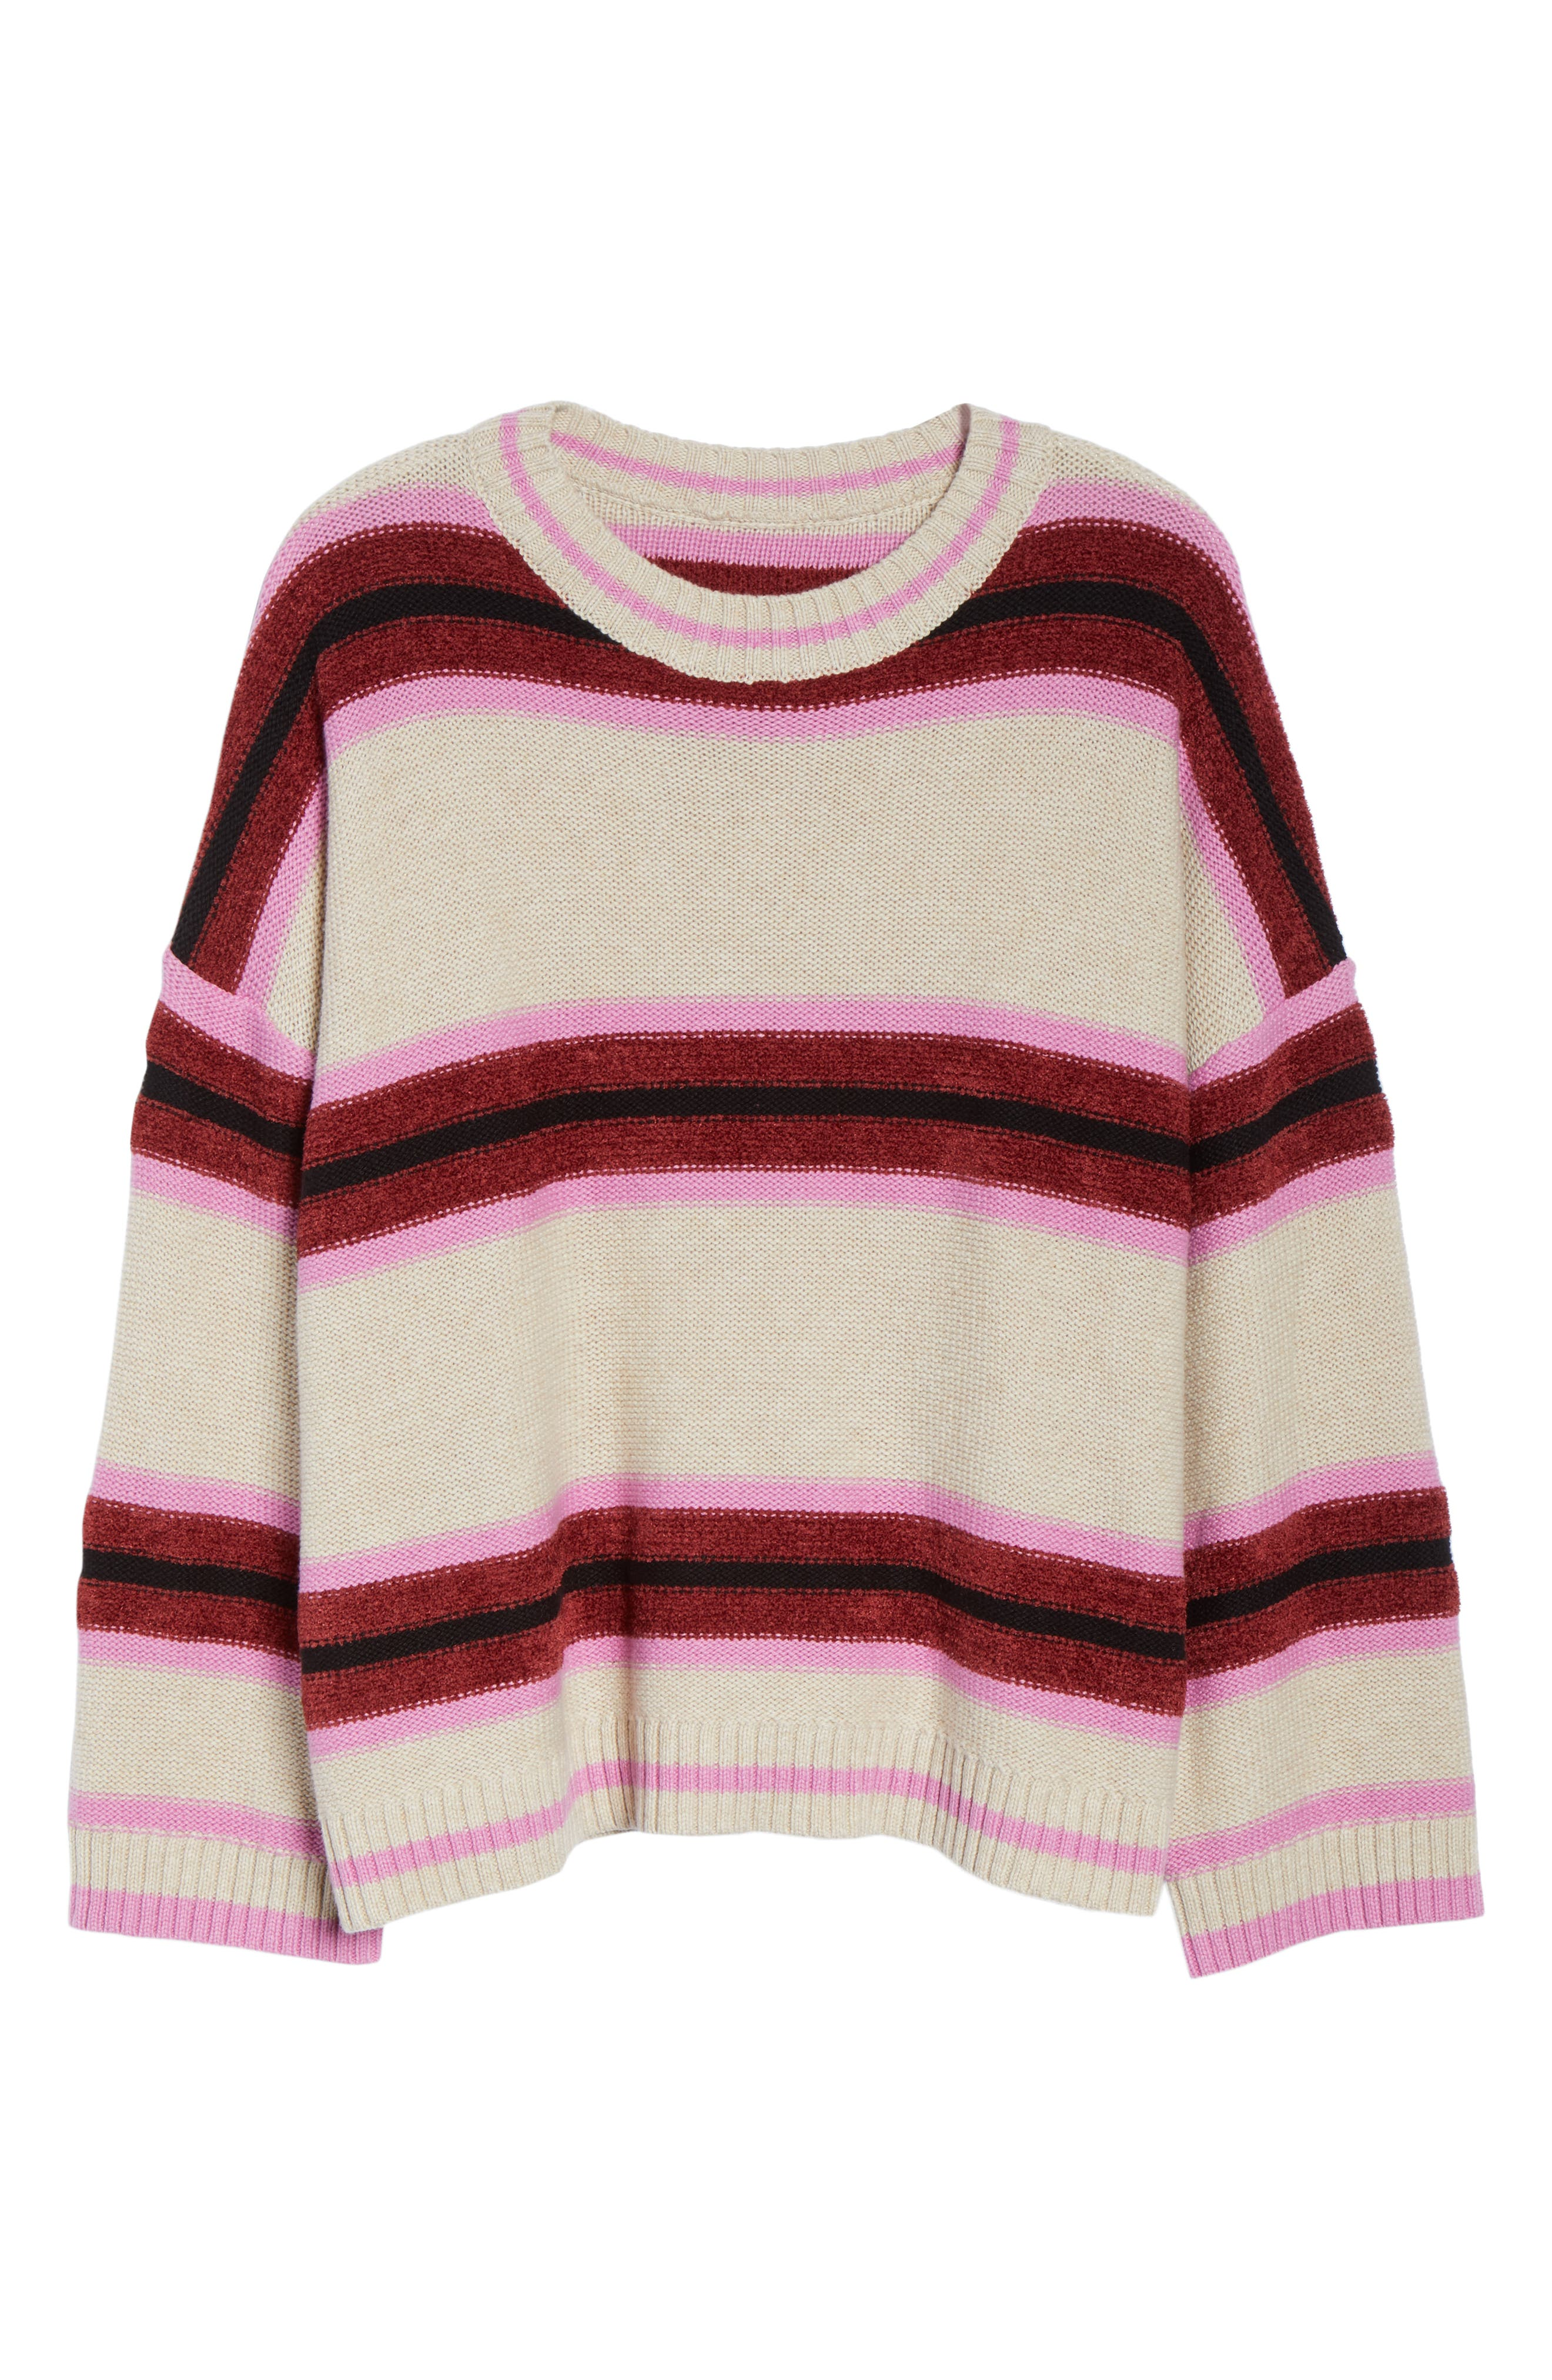 Everyday Stripe Sweater,                             Alternate thumbnail 6, color,                             BEIGE HEATHER ROBYN STRIPE